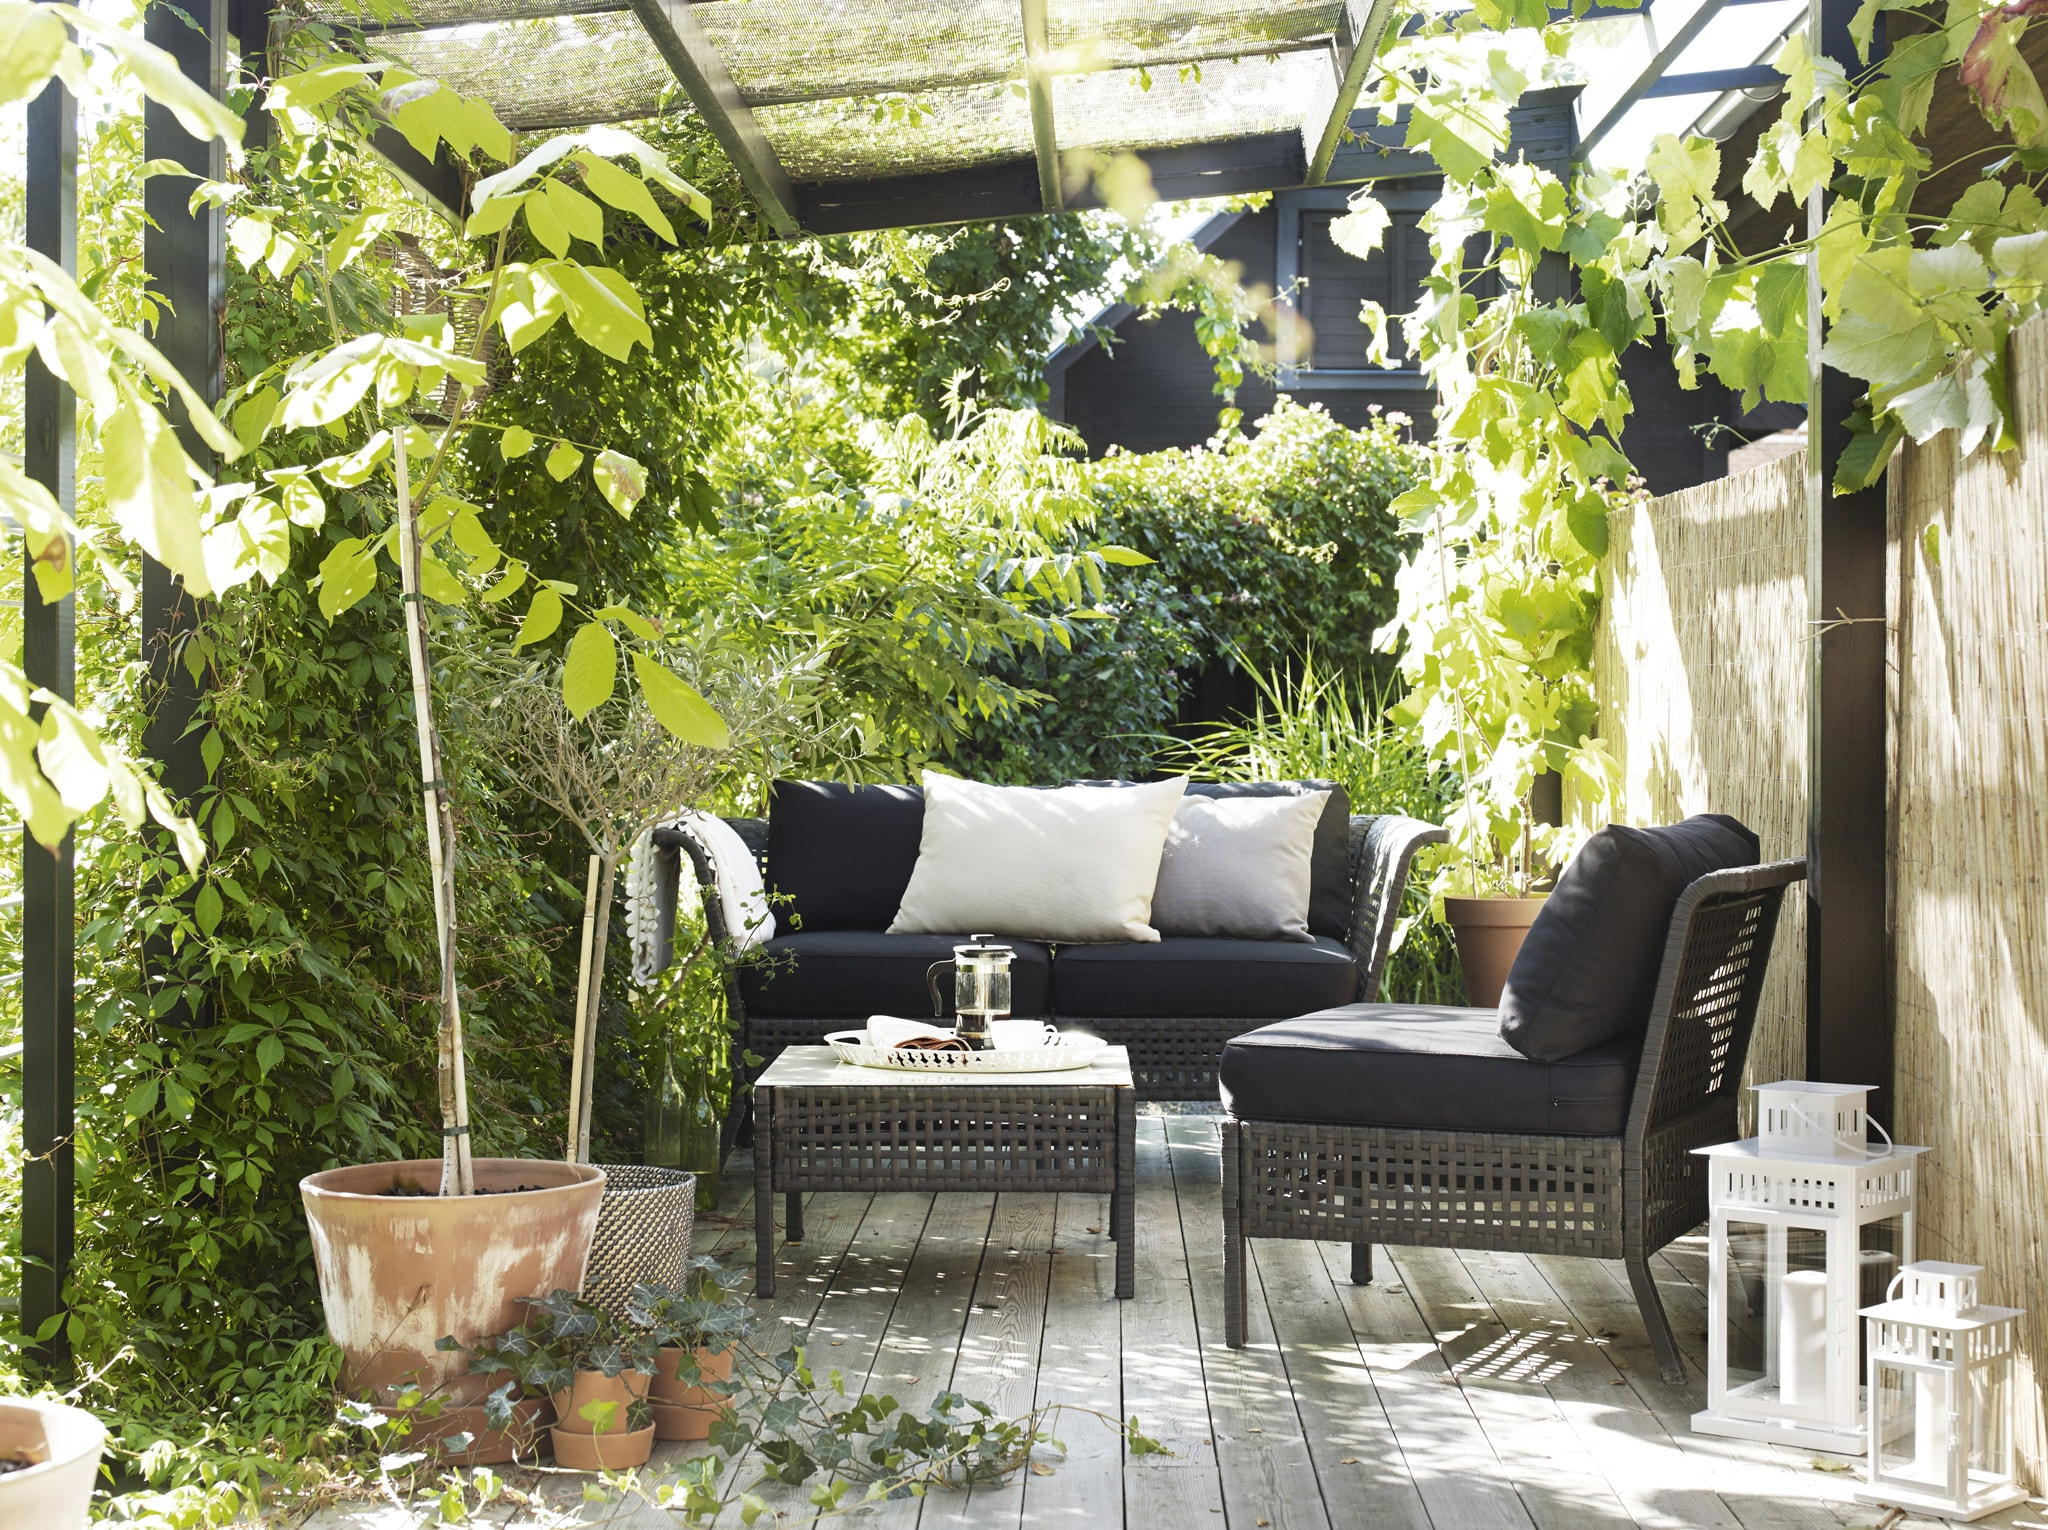 Ikea muebles de exterior finest ikea mesas de jardin ikea for Muebles exterior online